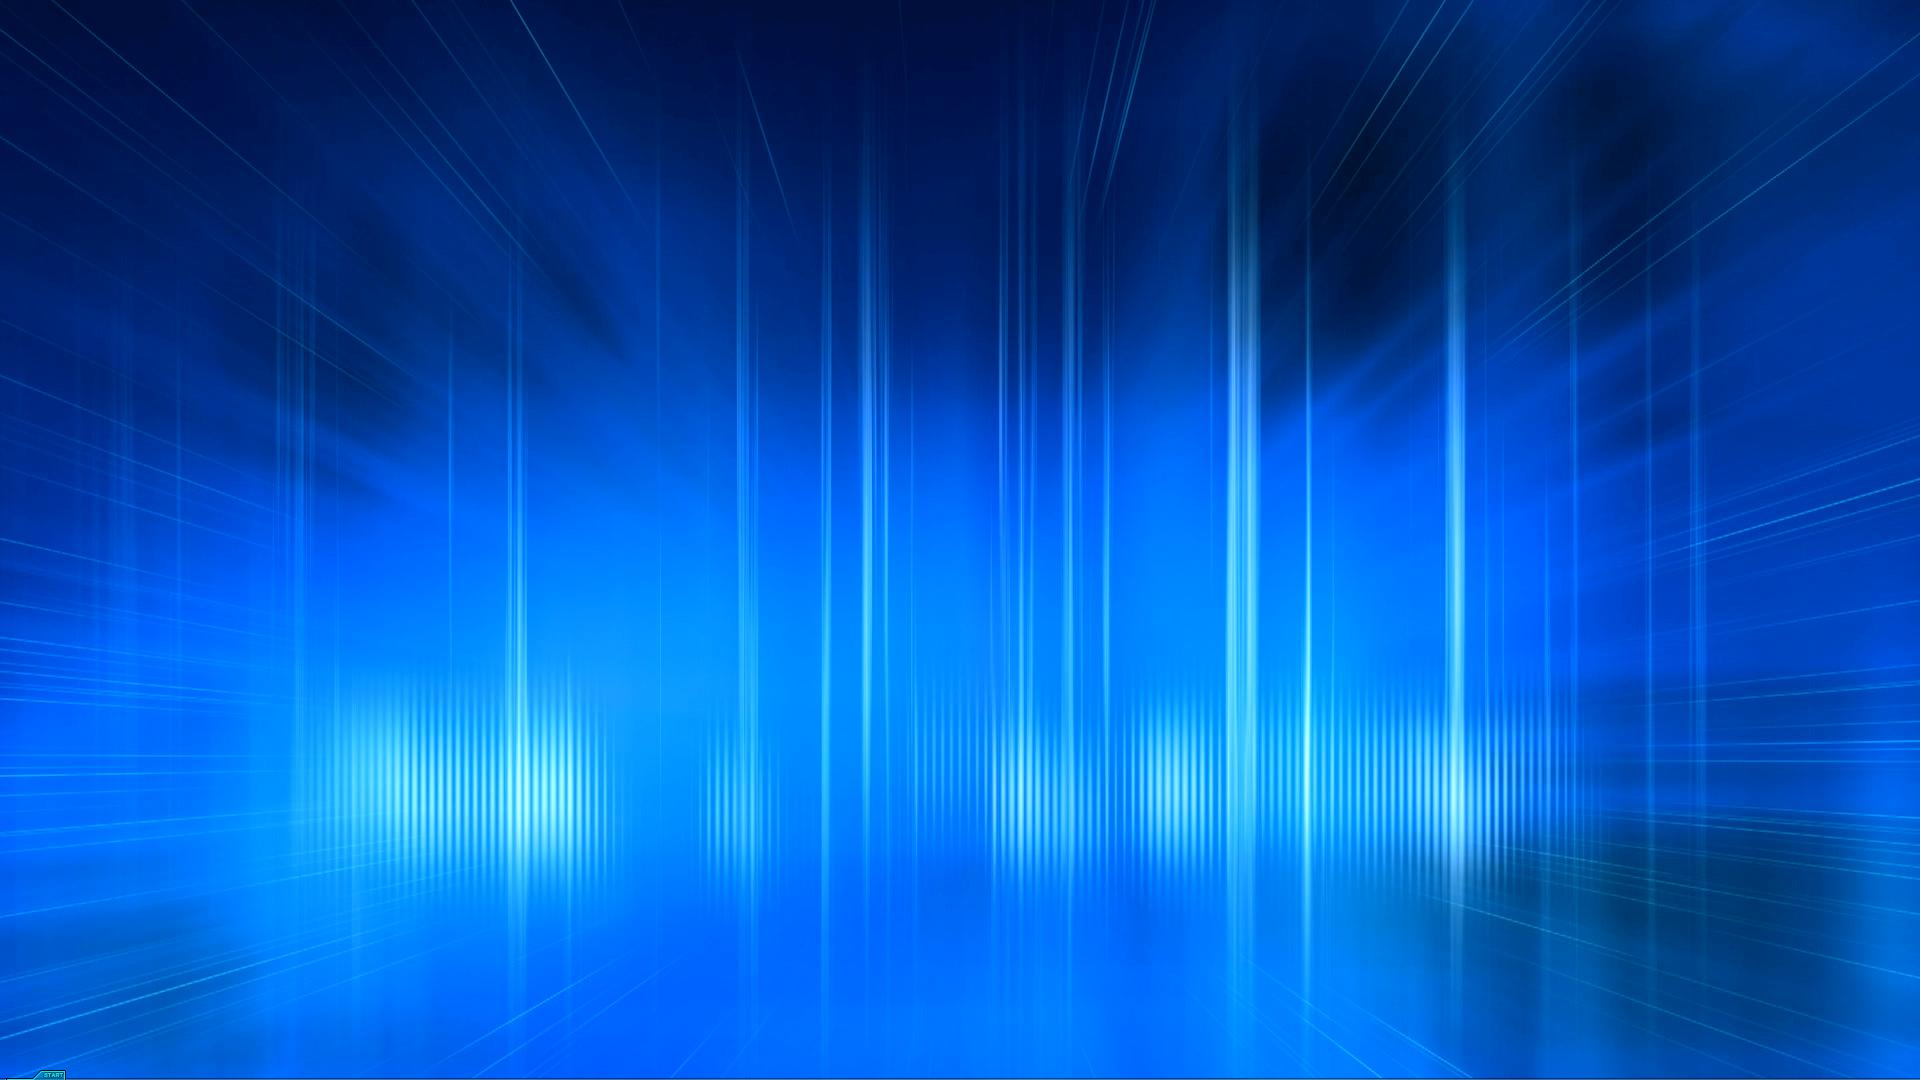 blue tech wallpaper wallpapersafari